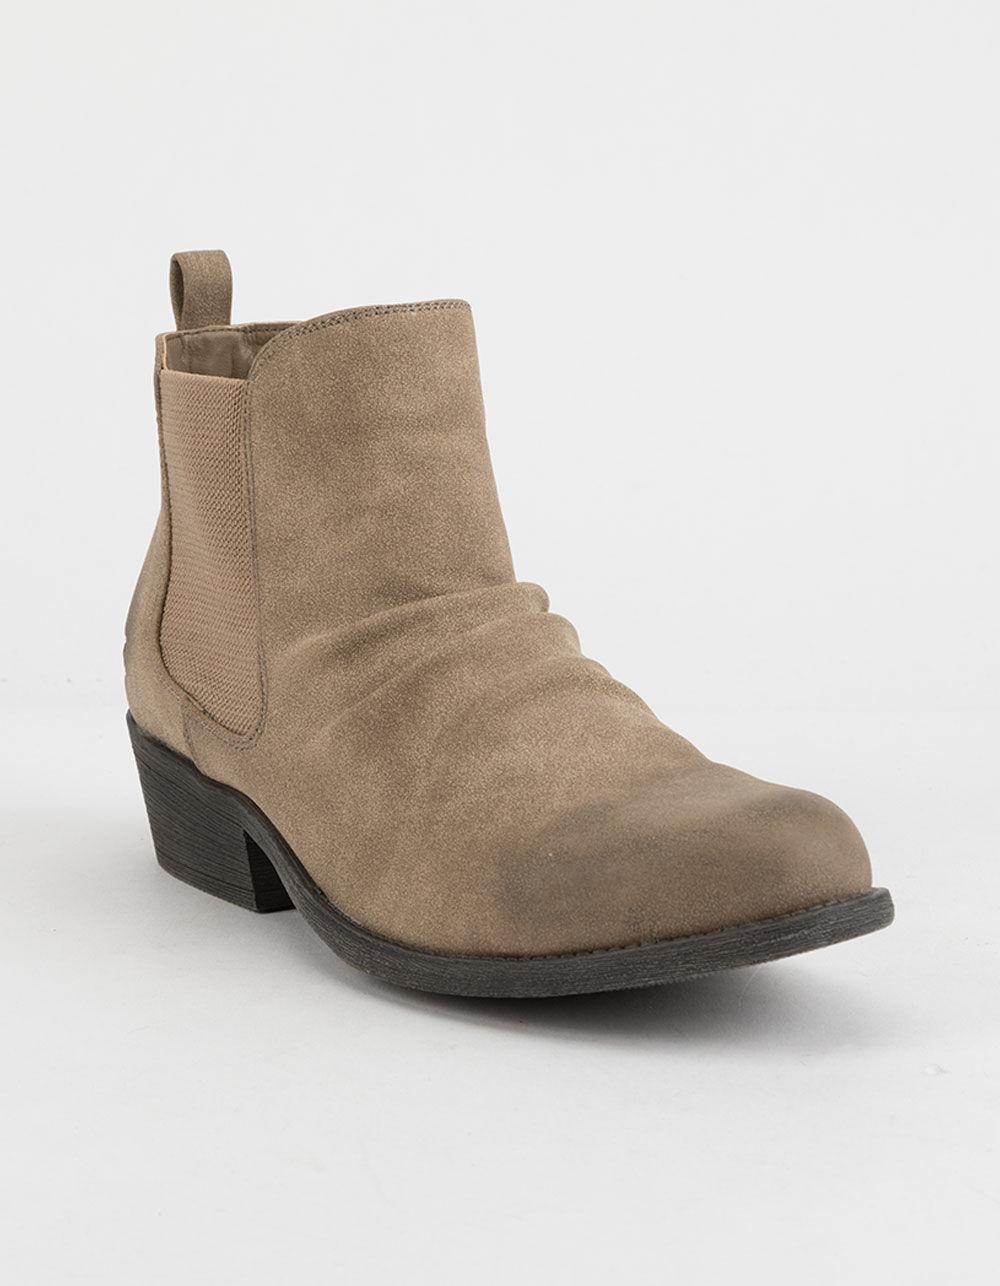 Lyst - Billabong Sweet Surrender Ankle Boot in Brown - Save ... 28510de1d413